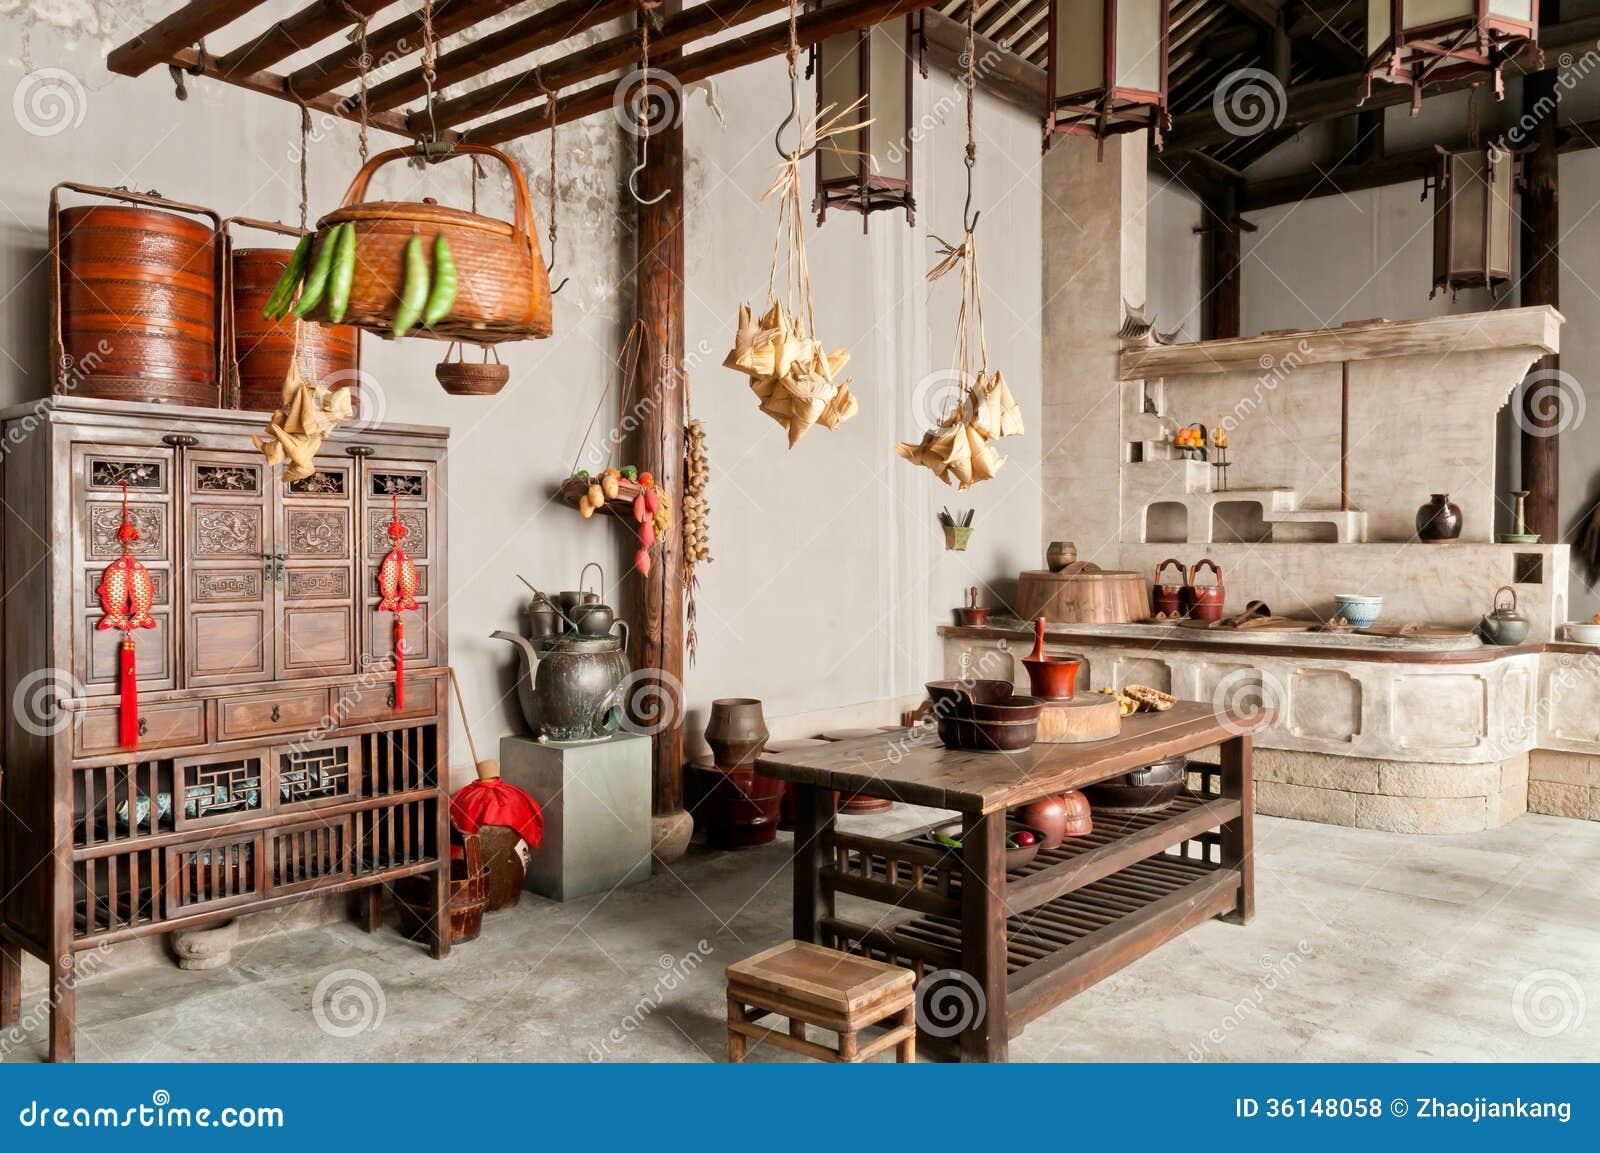 China old kitchen furnishings royalty free stock photos image